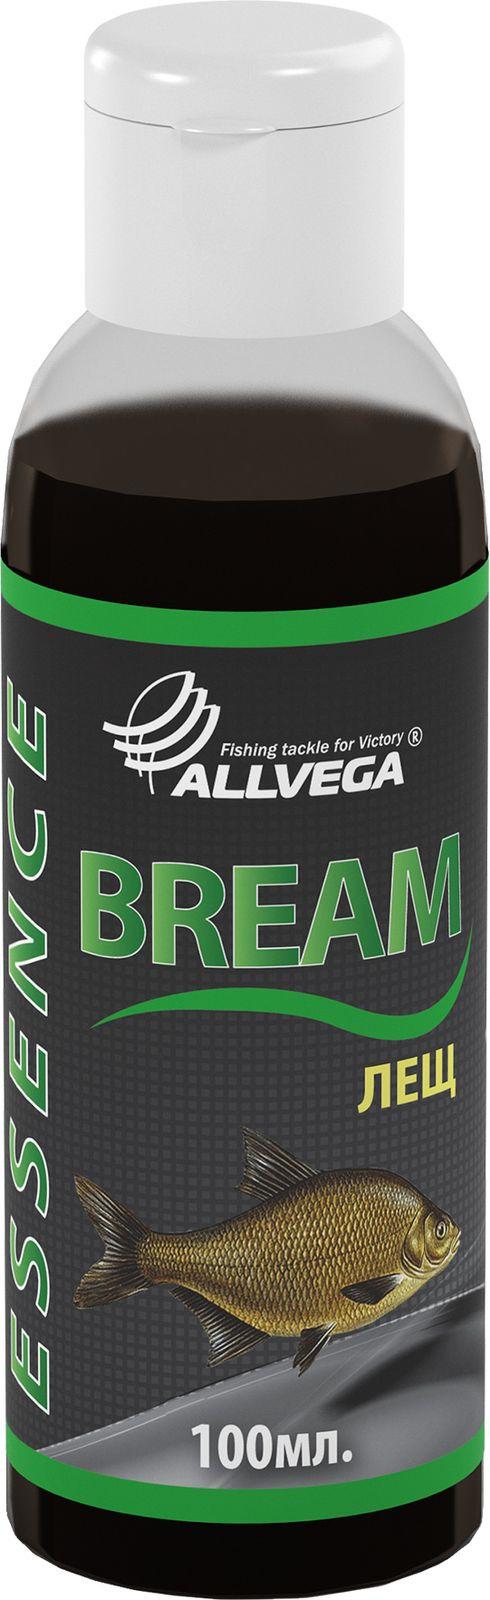 Ароматизатор-концентрат для рыбалки Allvega Essence Big Bream Крупный лещ , 100 мл ароматизатор чеснок для рыбалки